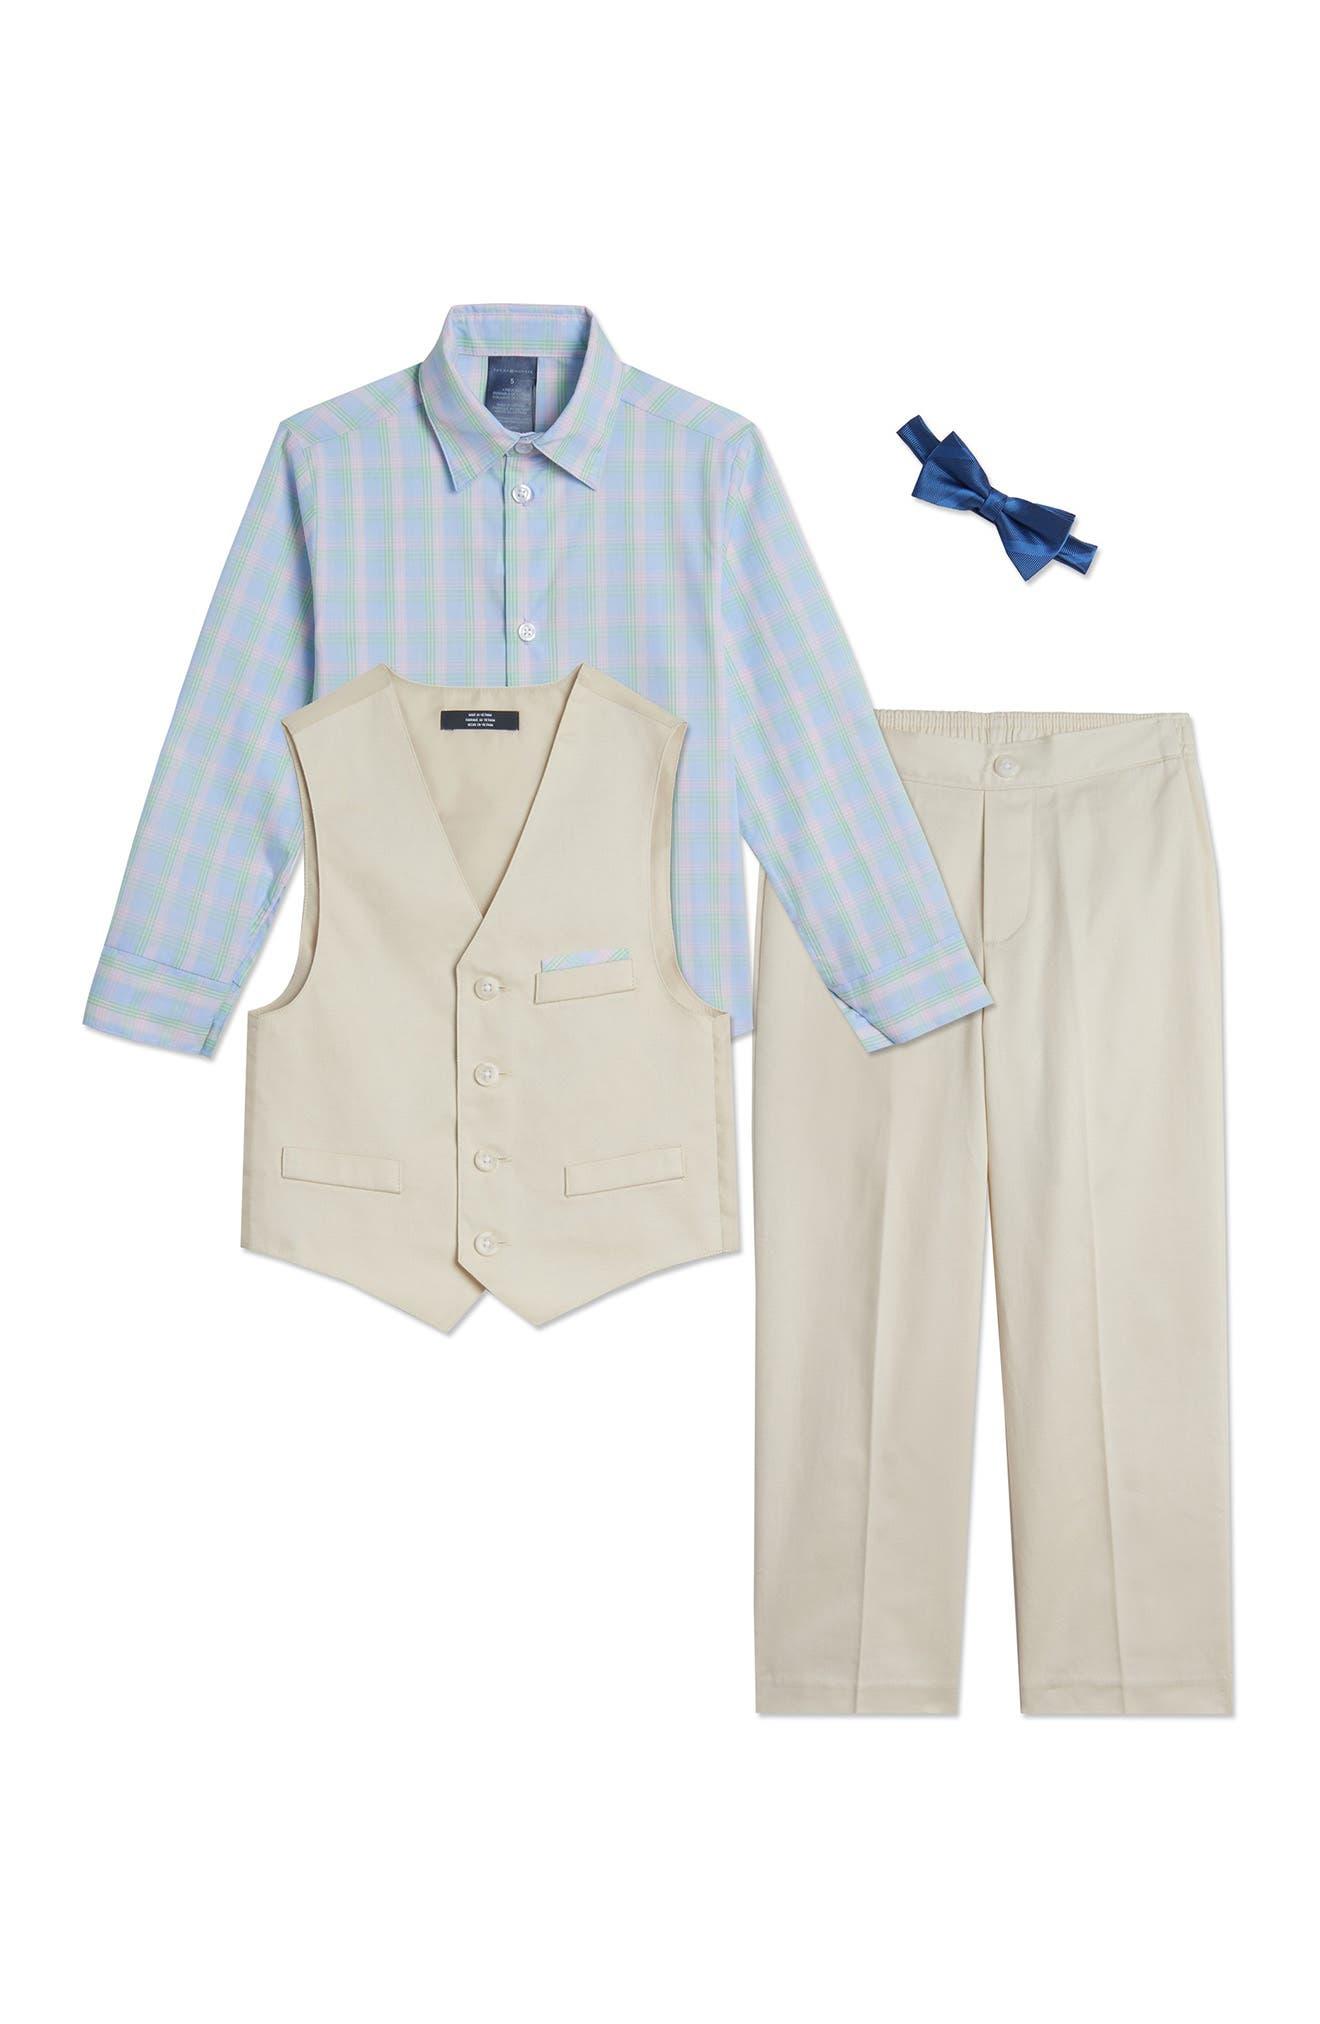 Image of Tommy Hilfiger Solid Twill Vest 4-Piece Set